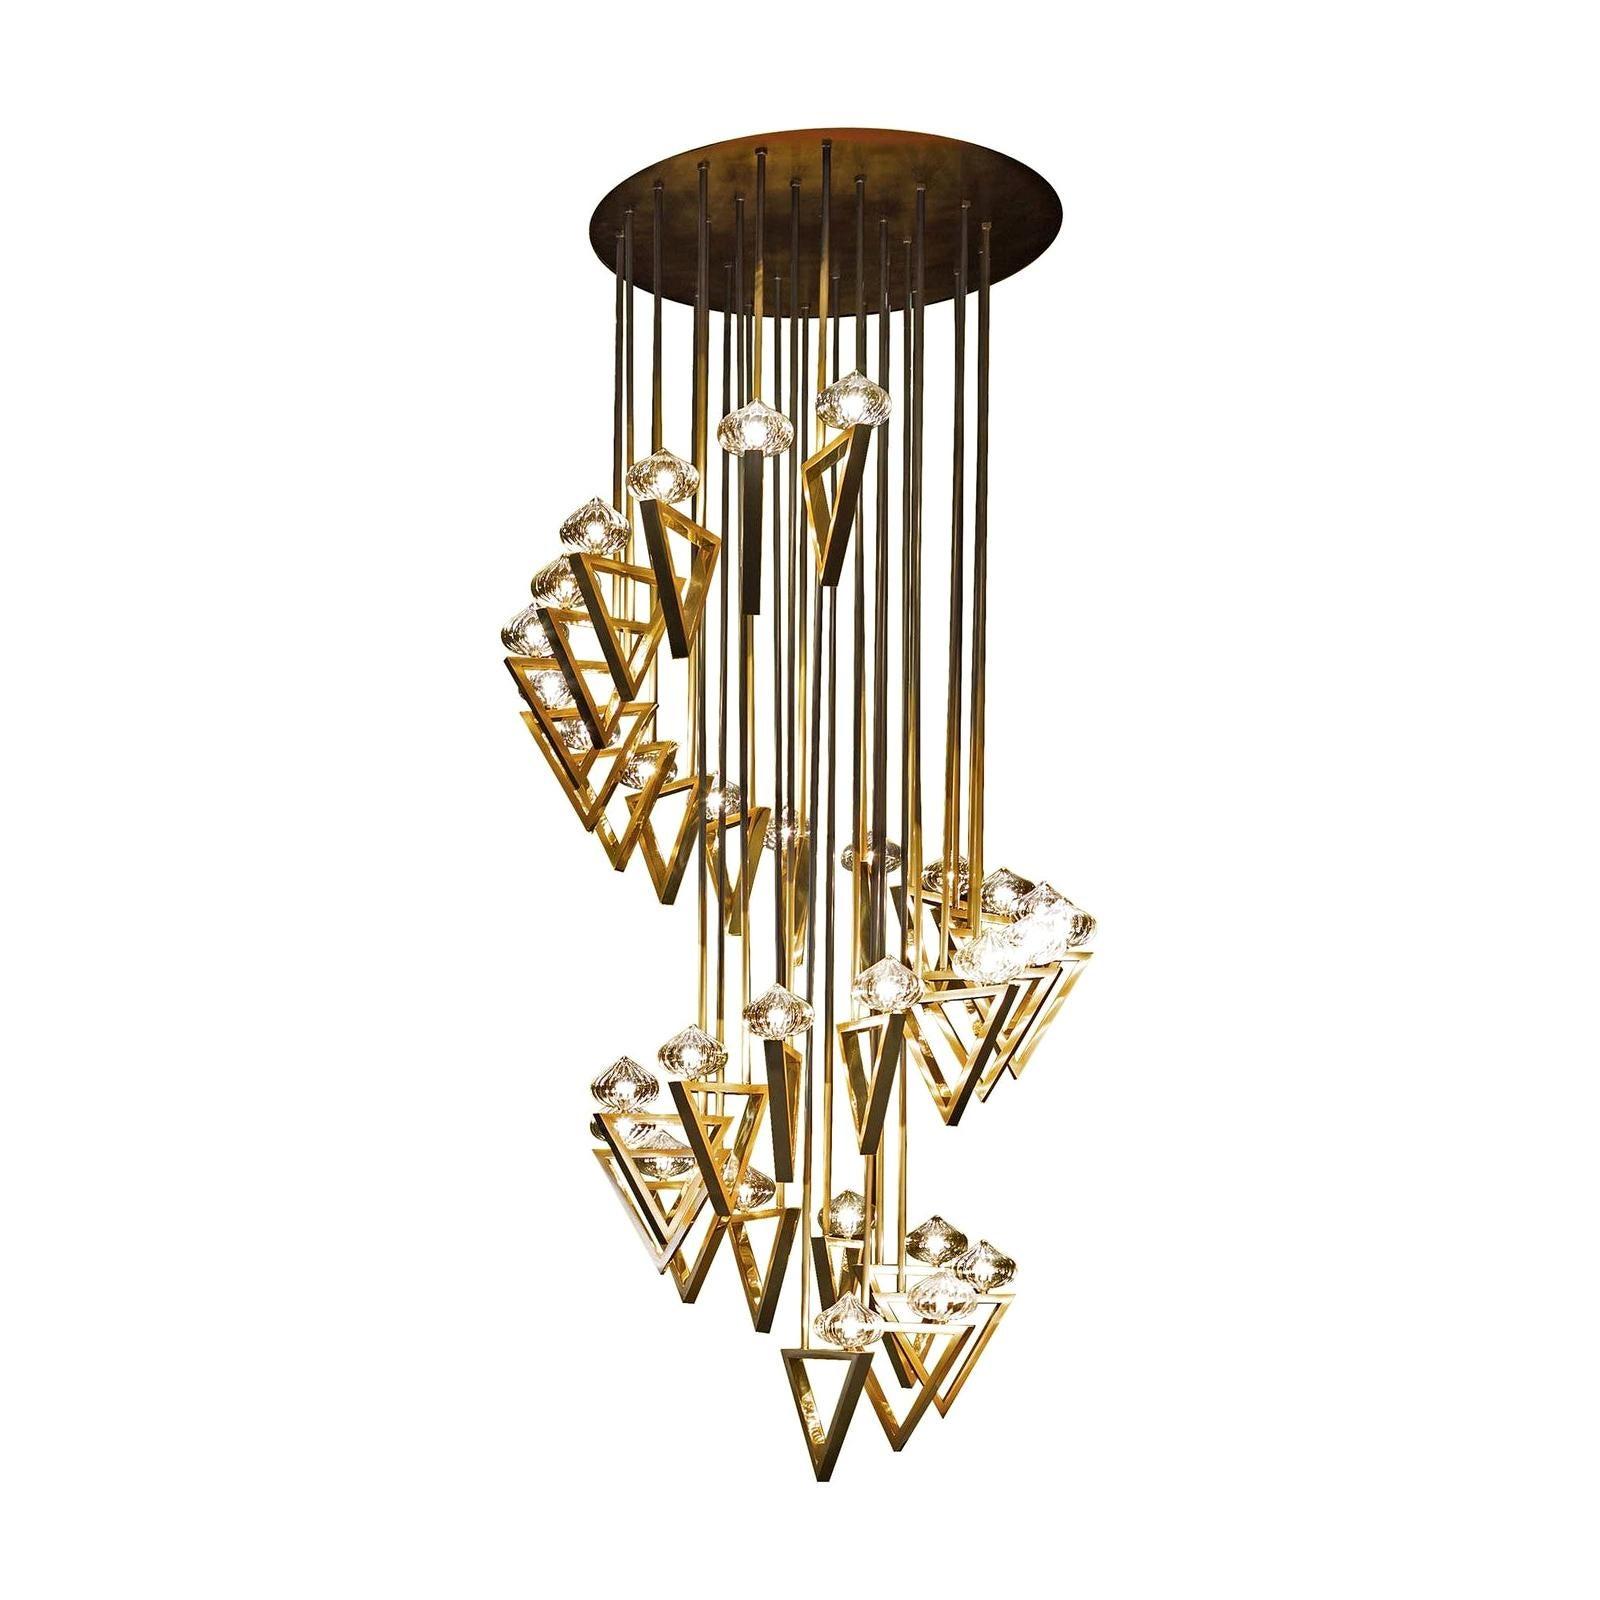 Lina 03 Light Triangle, Modern Minimal Geometric Chandelier, Polished Brass